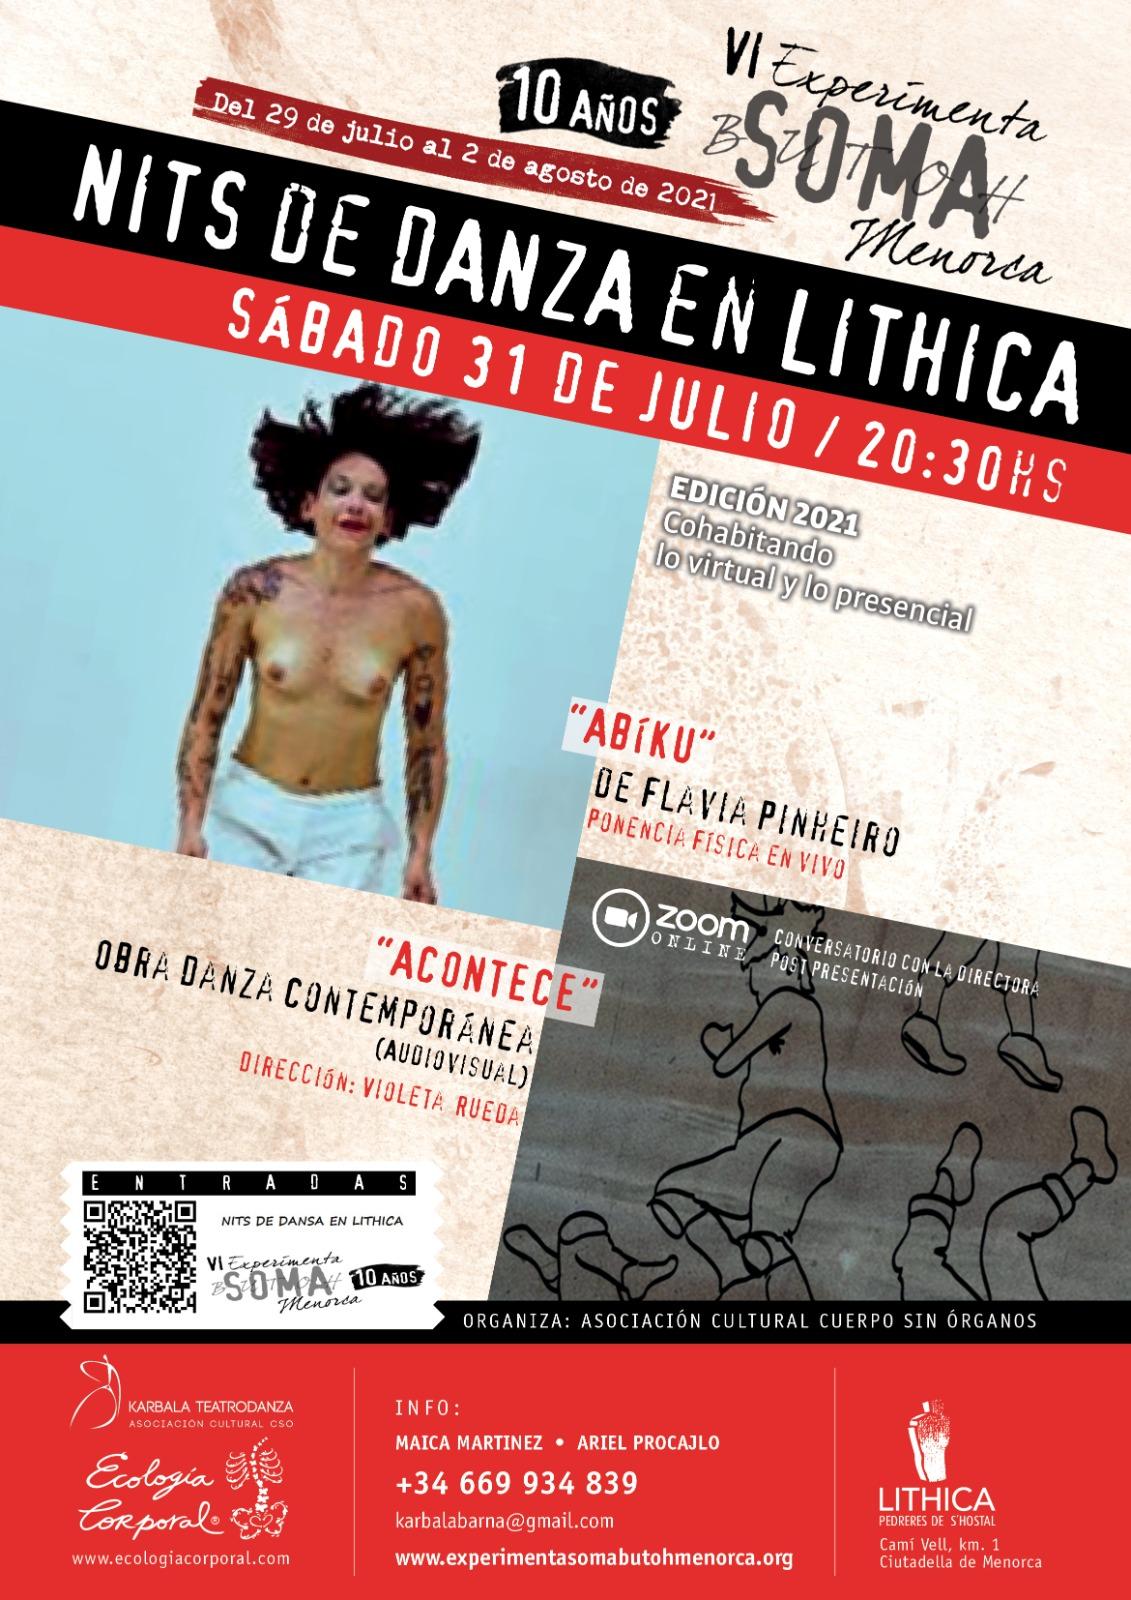 NITS DE DANSA - LÍTHICA